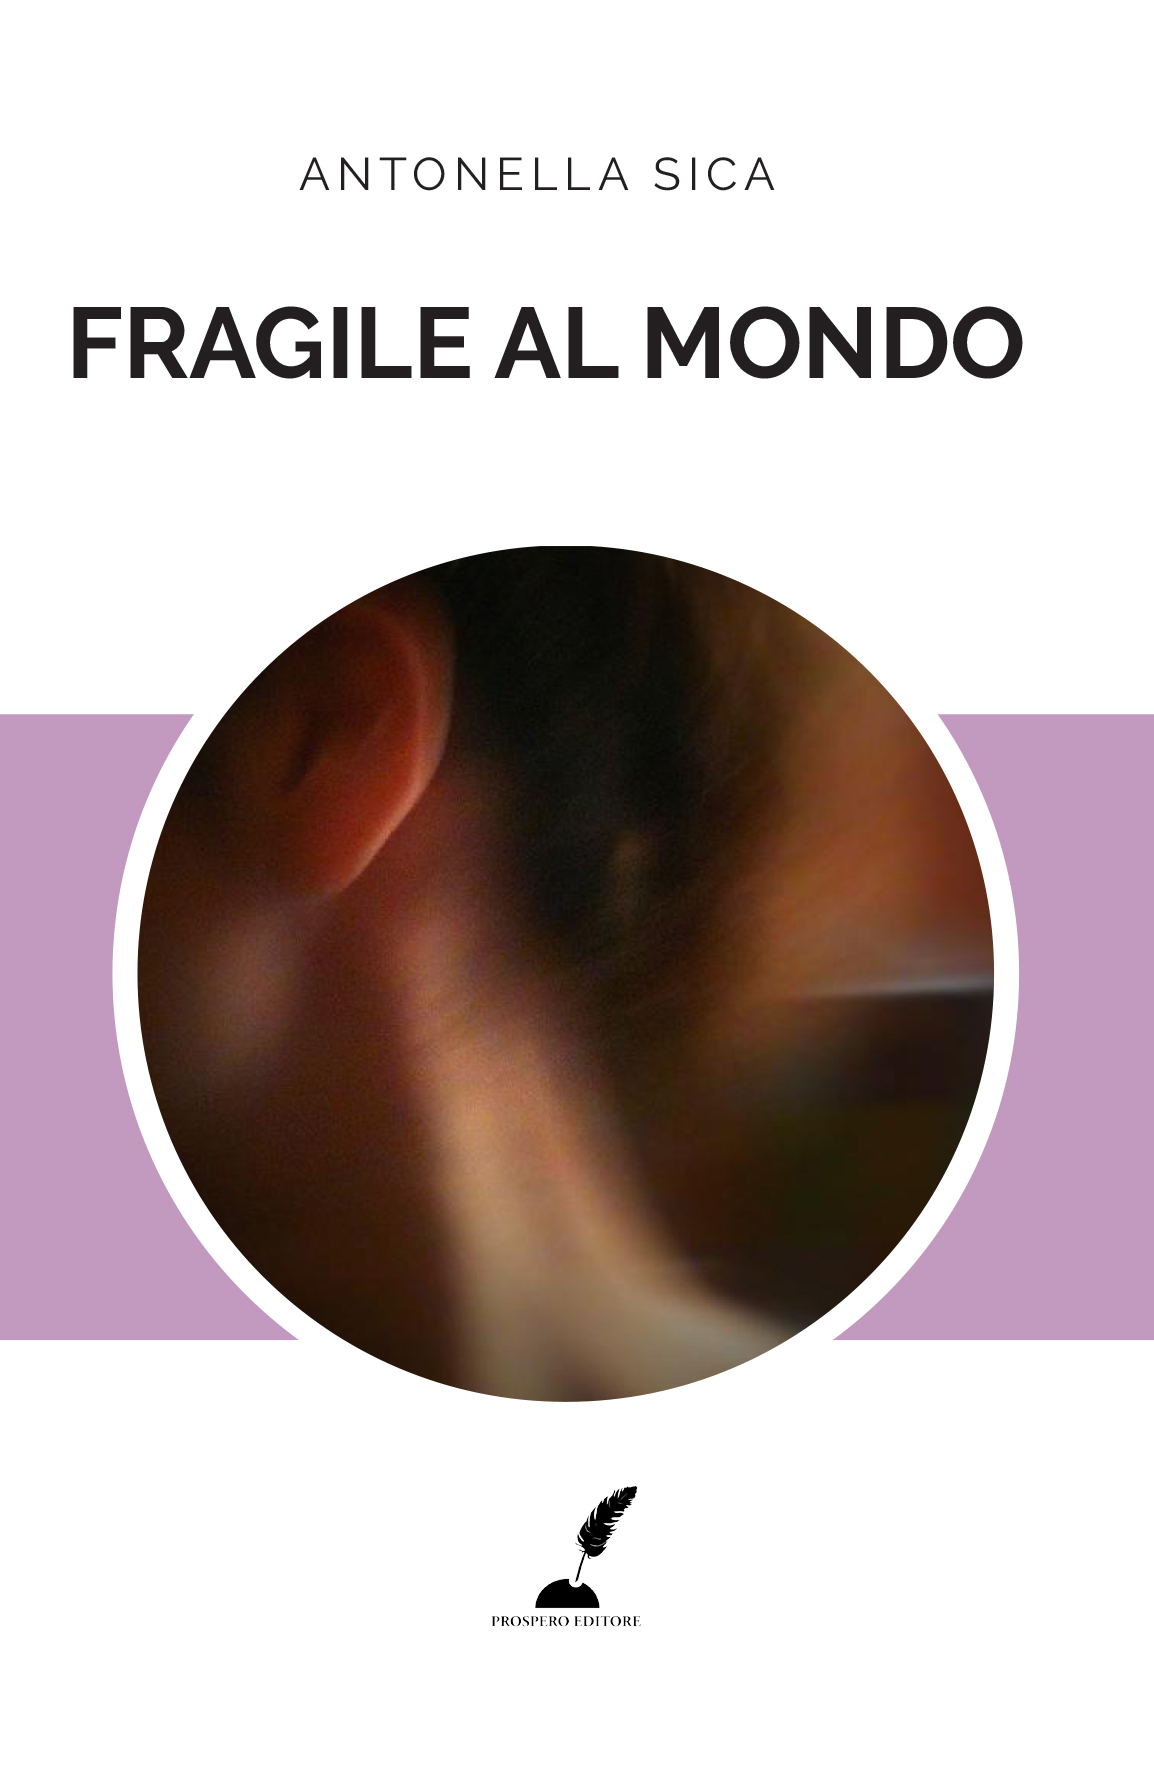 Fragile al mondo-image